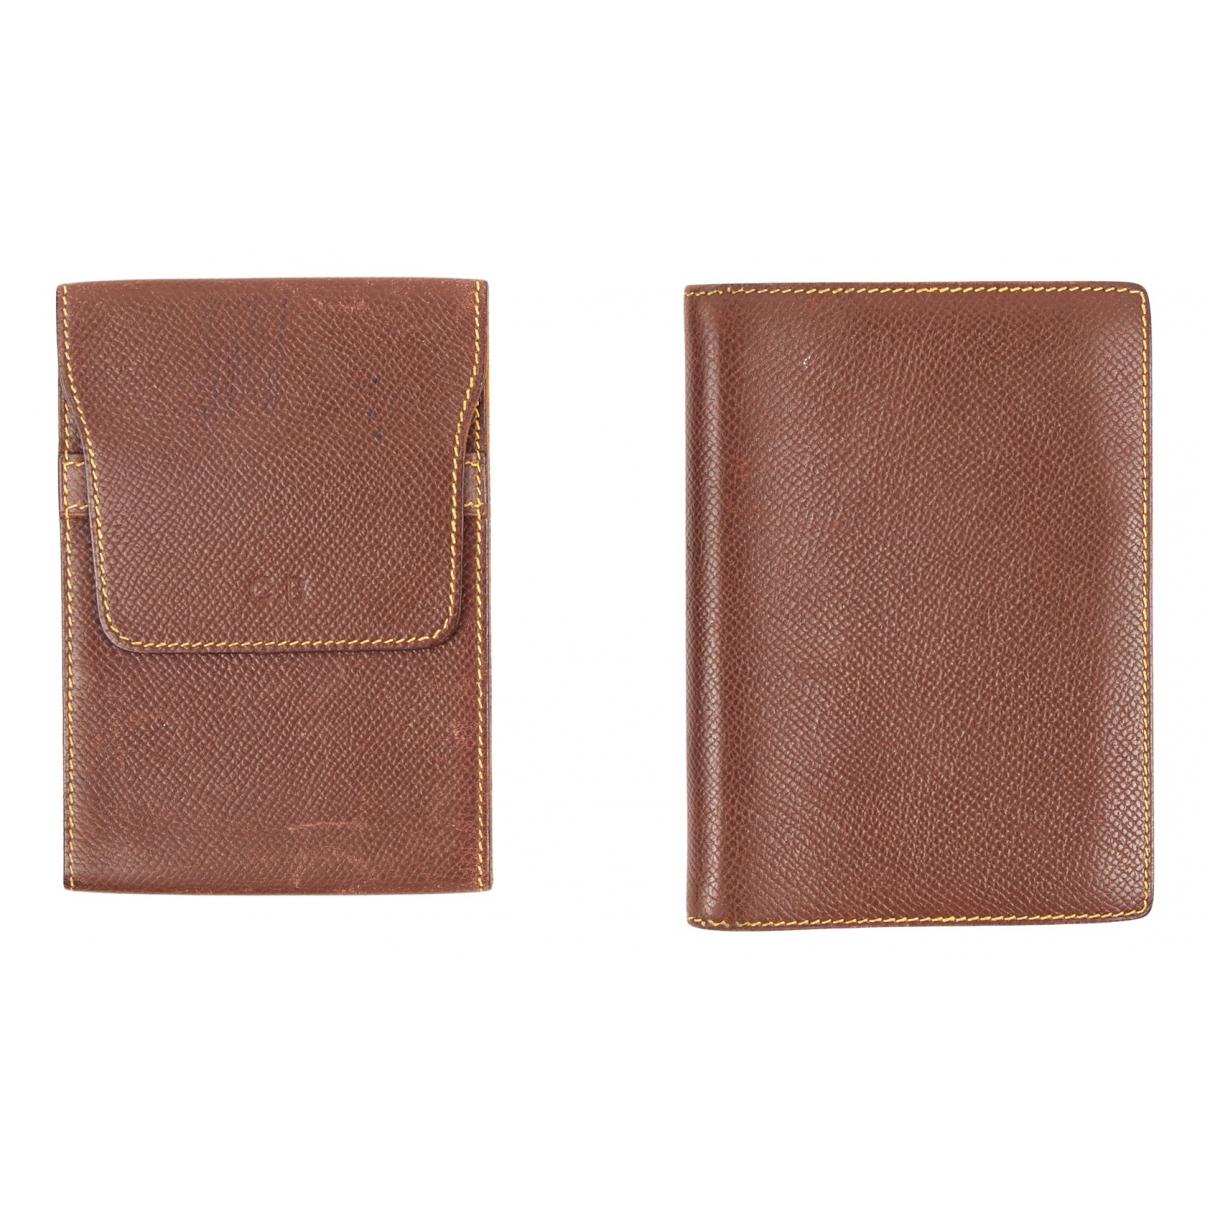 Hermès N Brown Leather Purses, wallet & cases for Women N